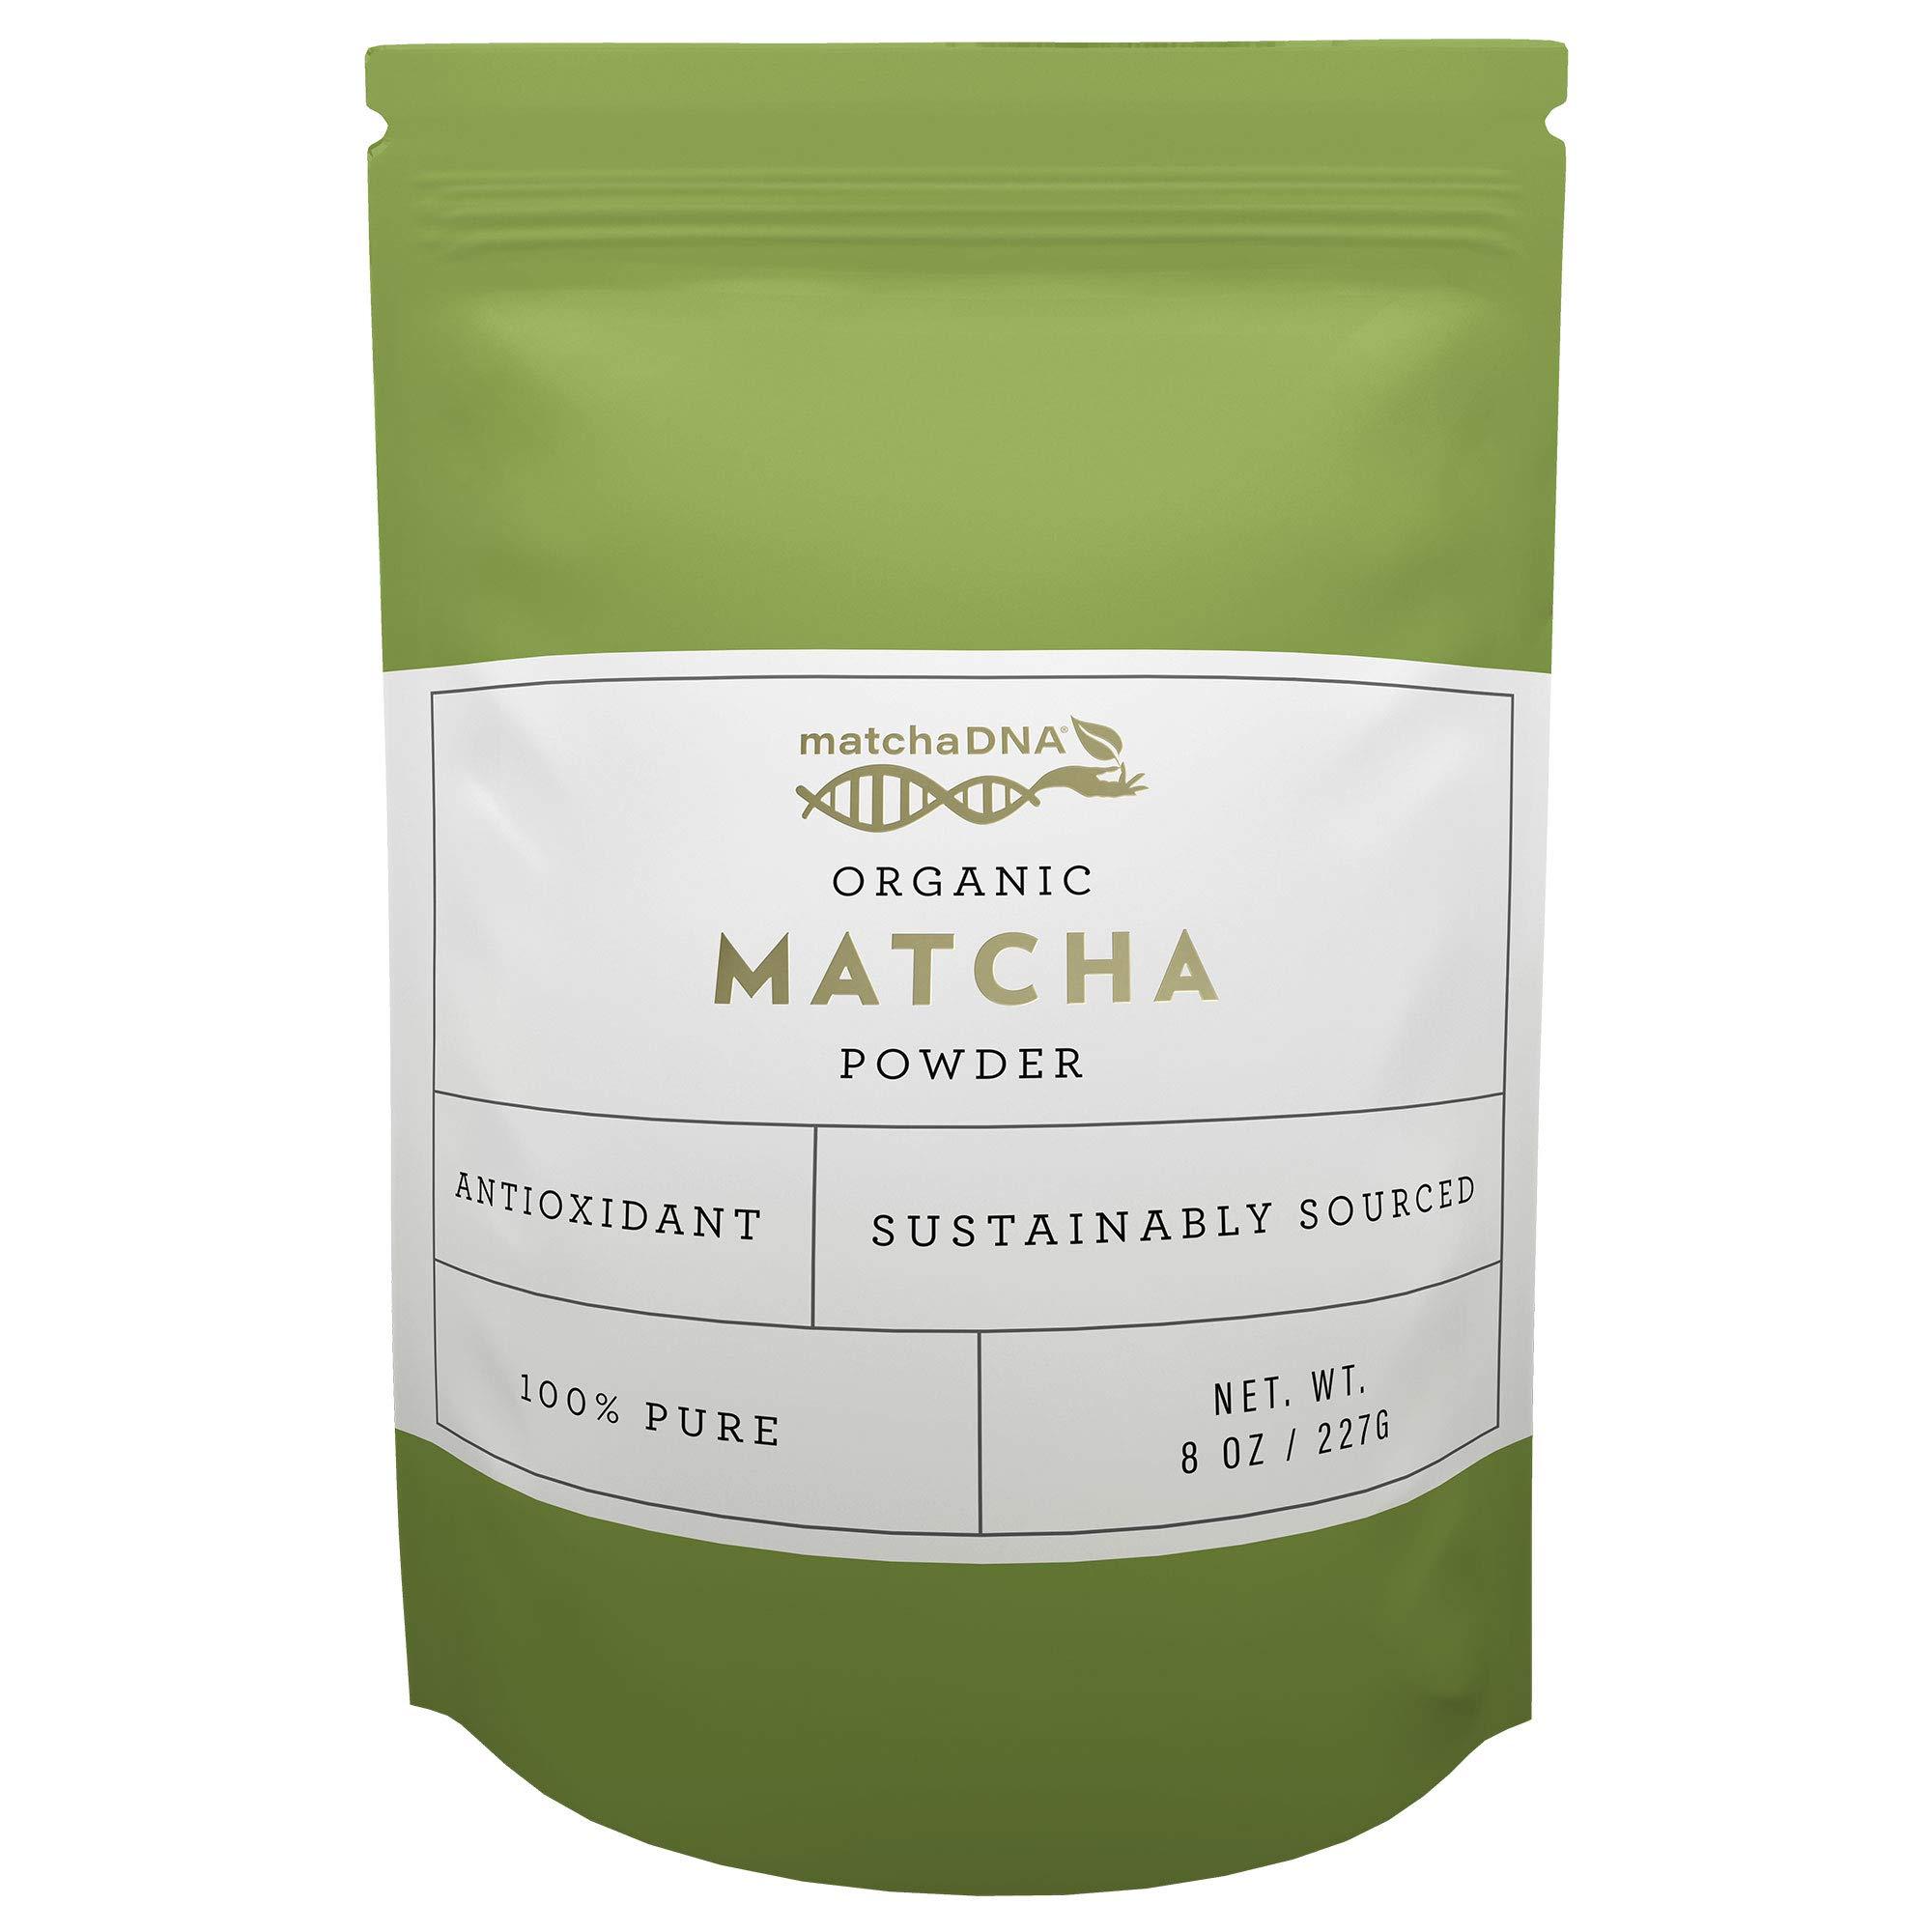 Matcha DNA USDA Organic Matcha Green Tea Powder Culinary Grade Powdered Matcha - High in antioxidants (8 Ounce)